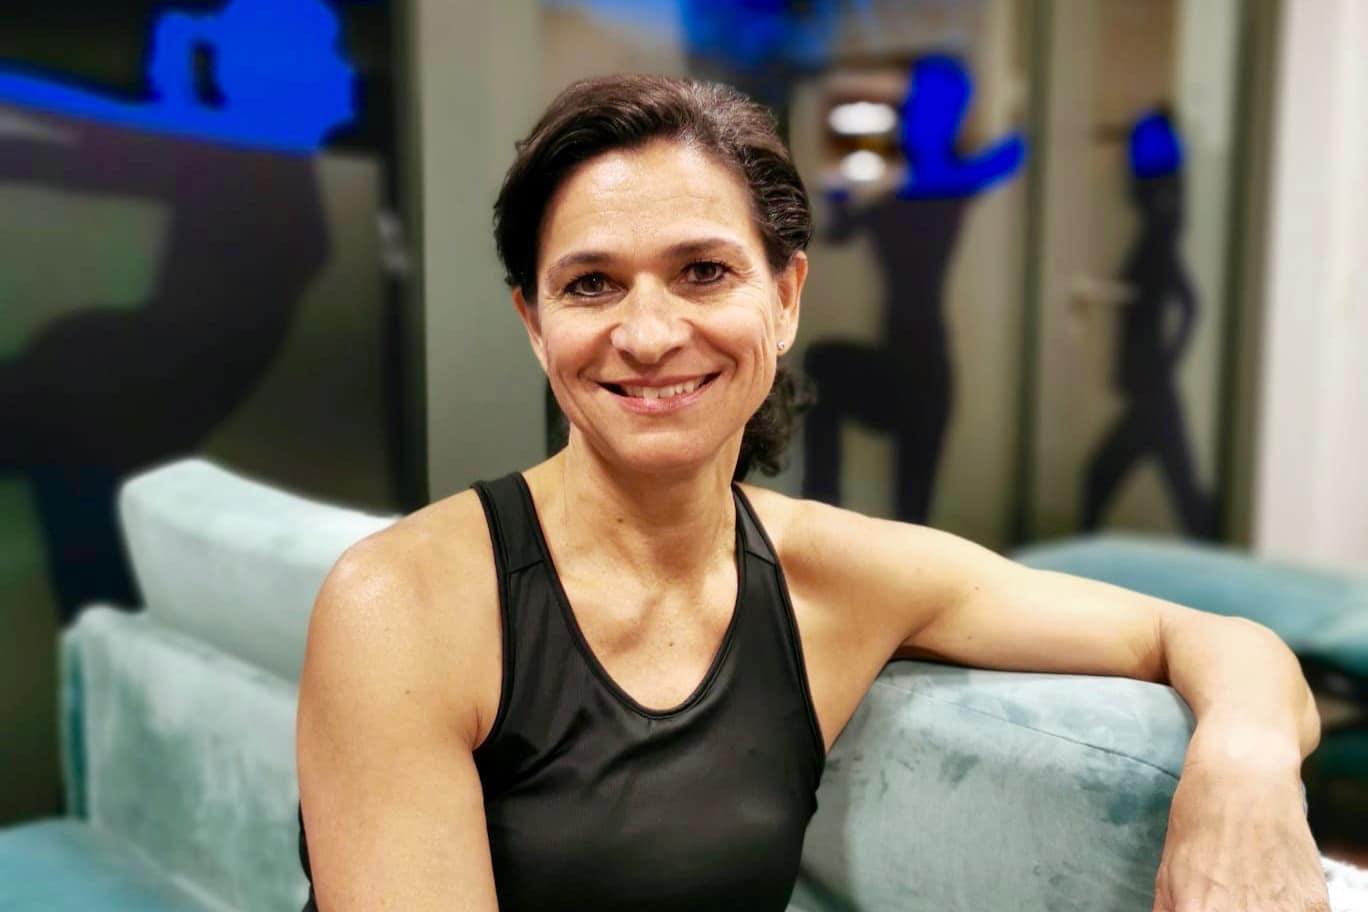 Bodymotion Fitness - Inhaberin Silvia Indergand